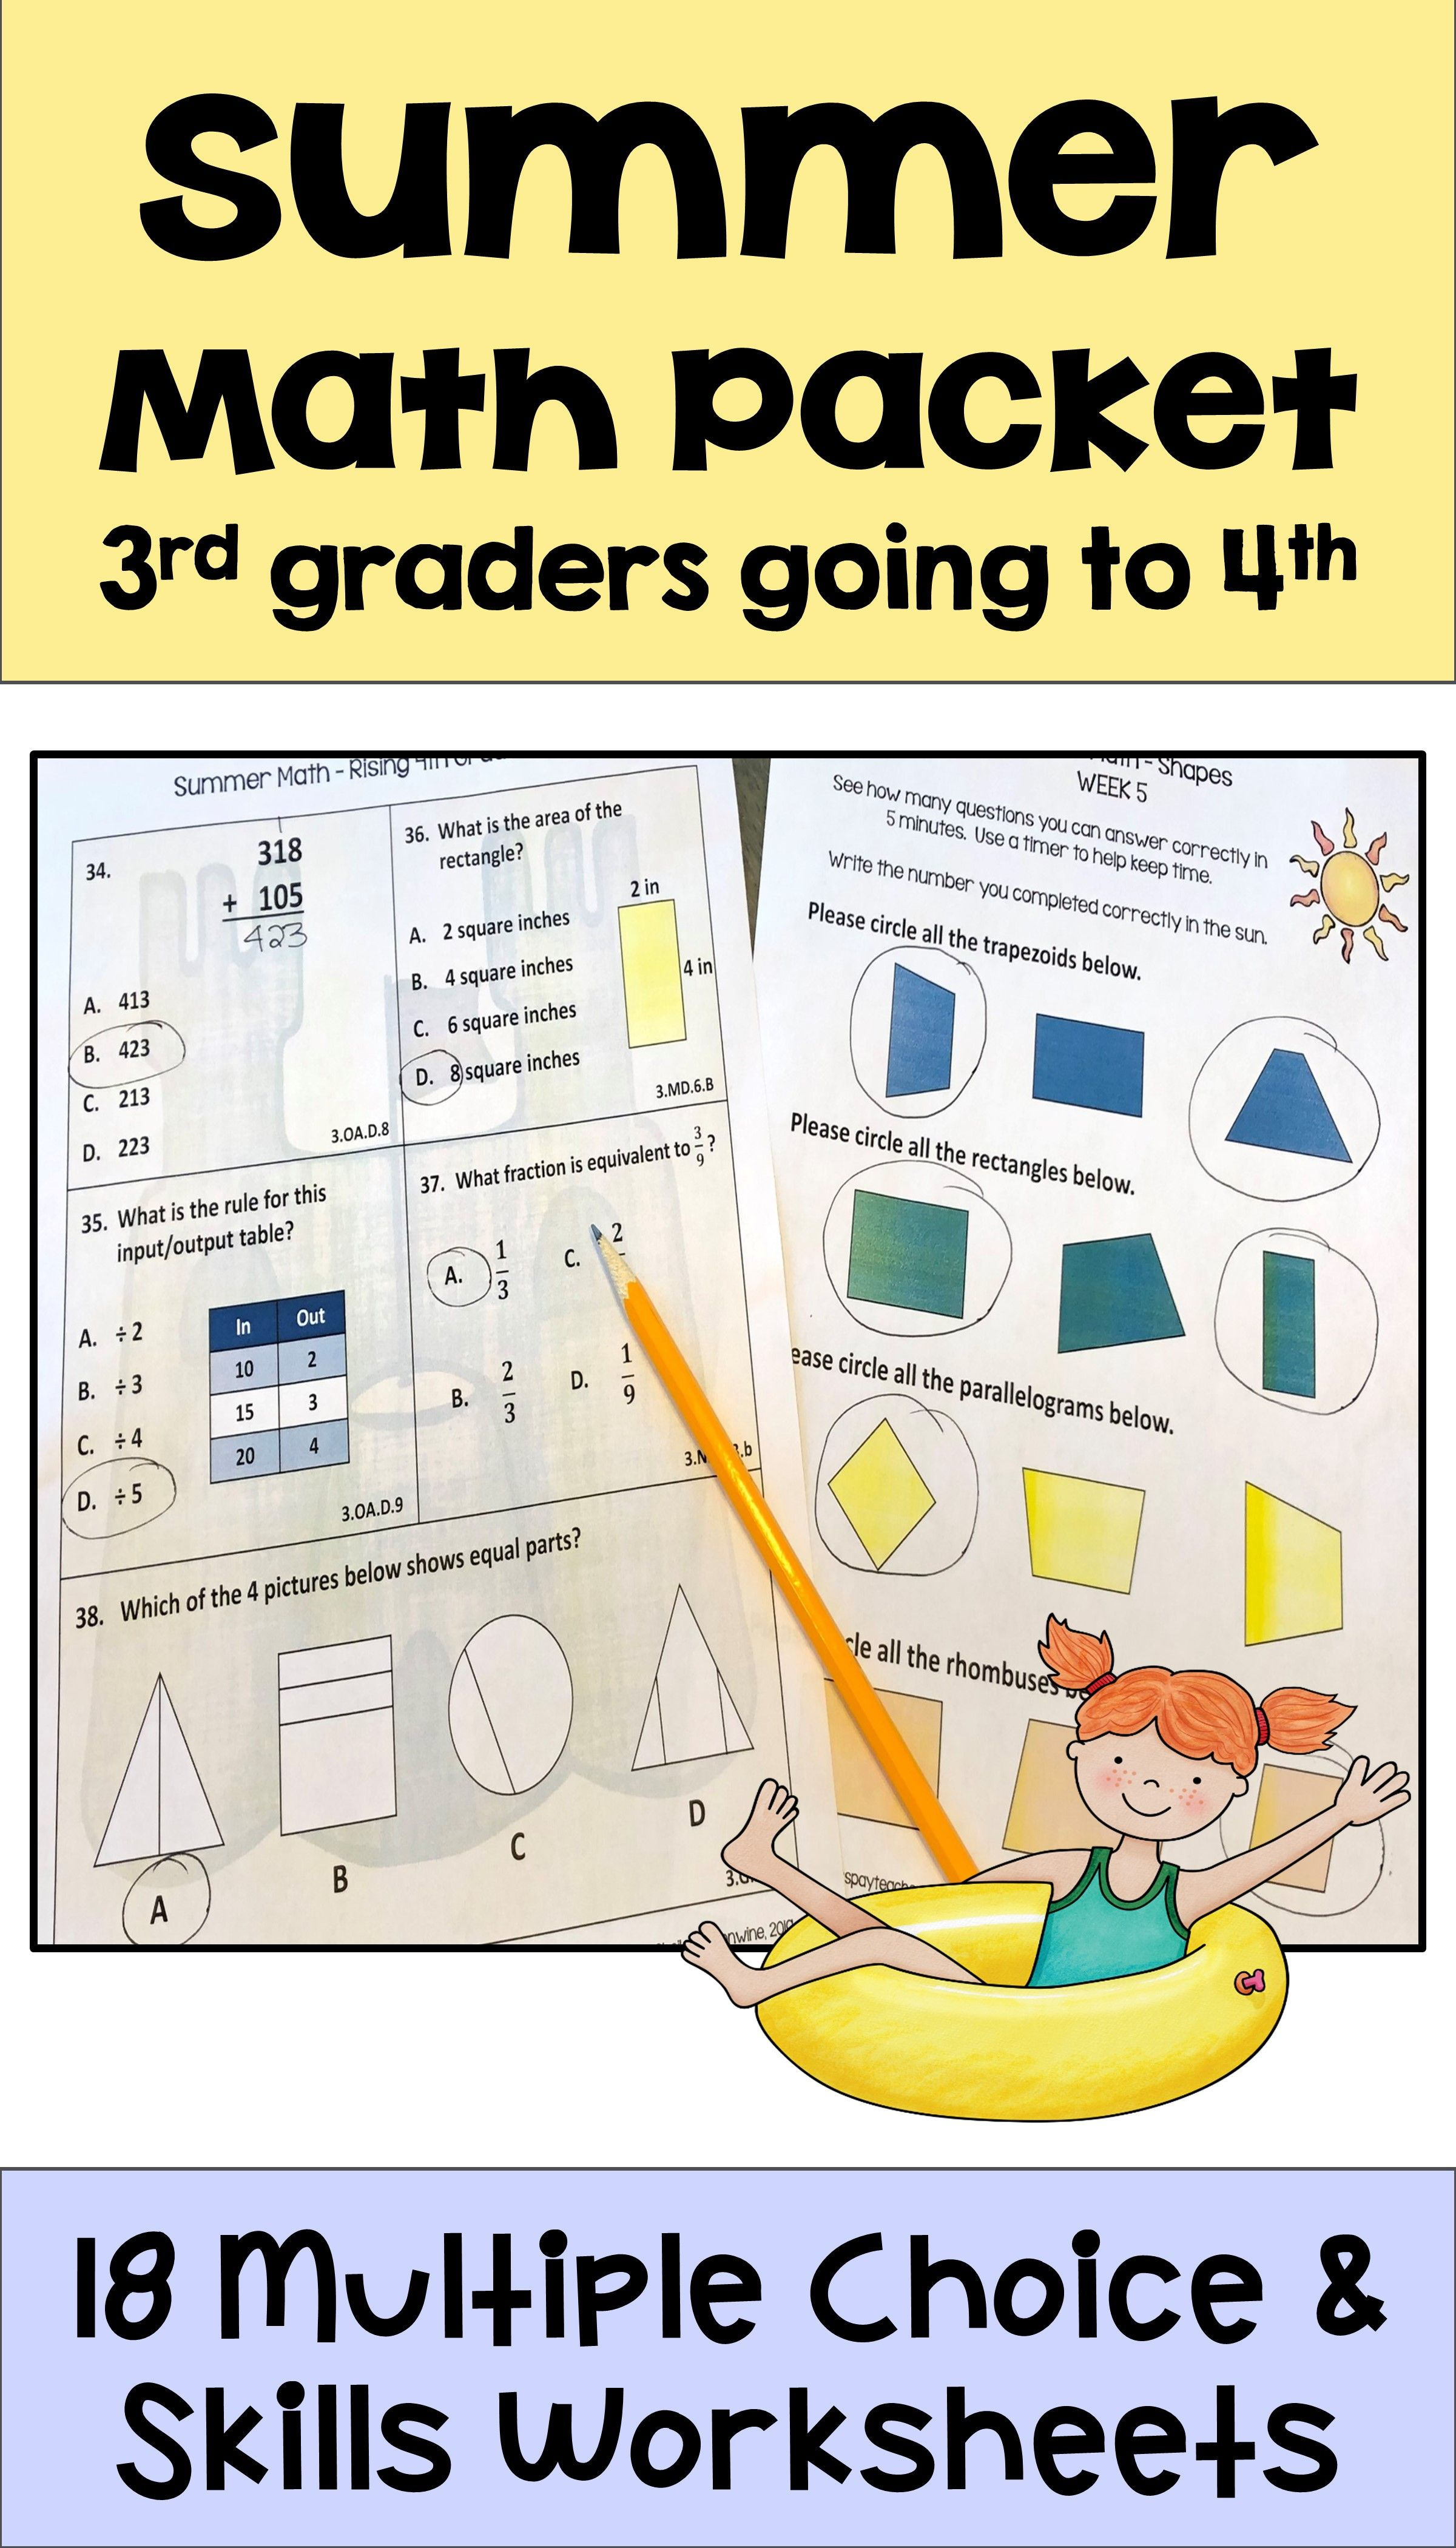 Summer Math Packet for Rising 4th Graders - Review of 3rd Grade Math   Math  packets [ 4200 x 2400 Pixel ]